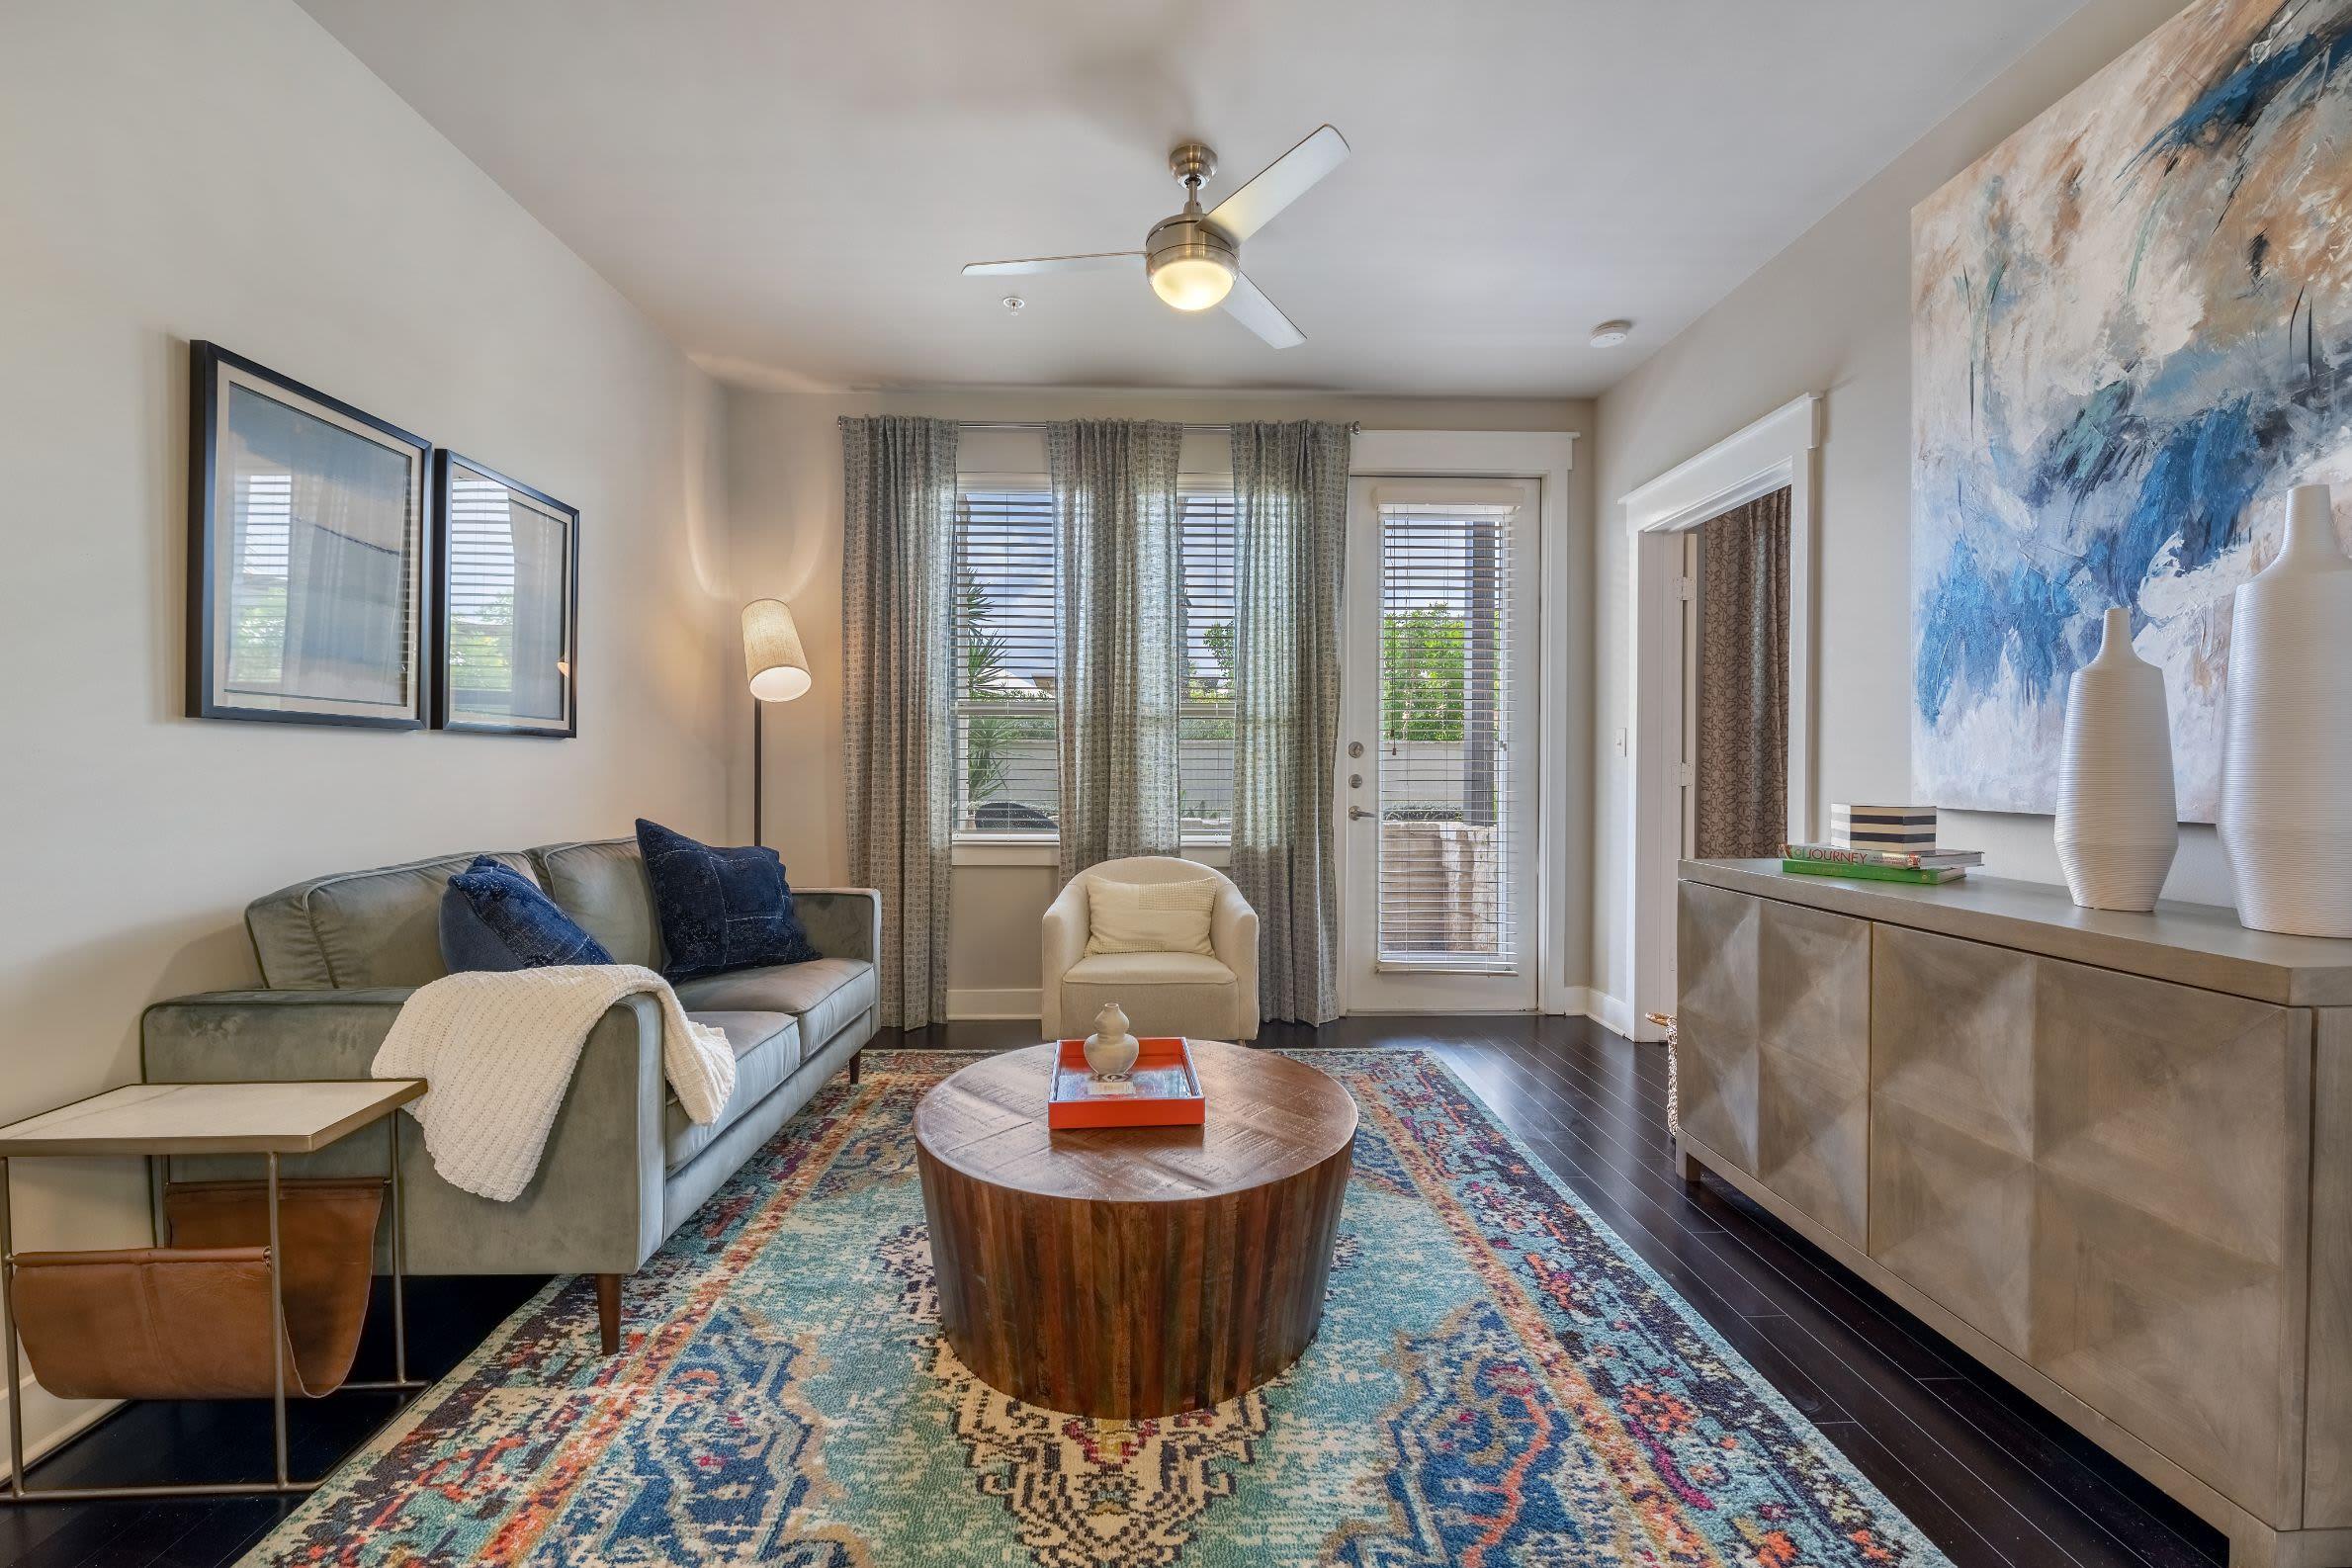 Living room with large rug at Marquis Cresta Bella in San Antonio, Texas